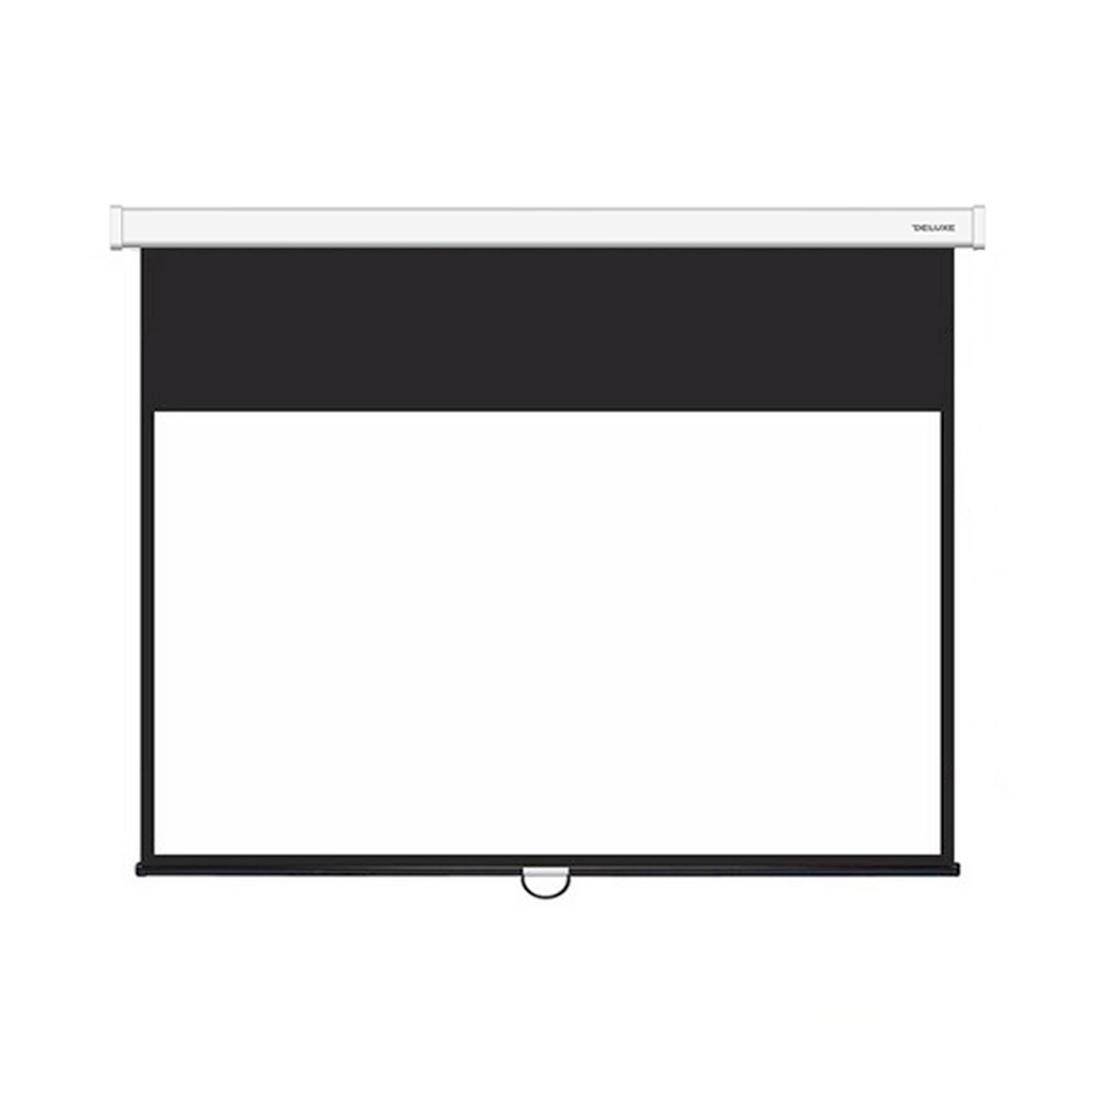 Экран Deluxe DLS-M221x121W (87